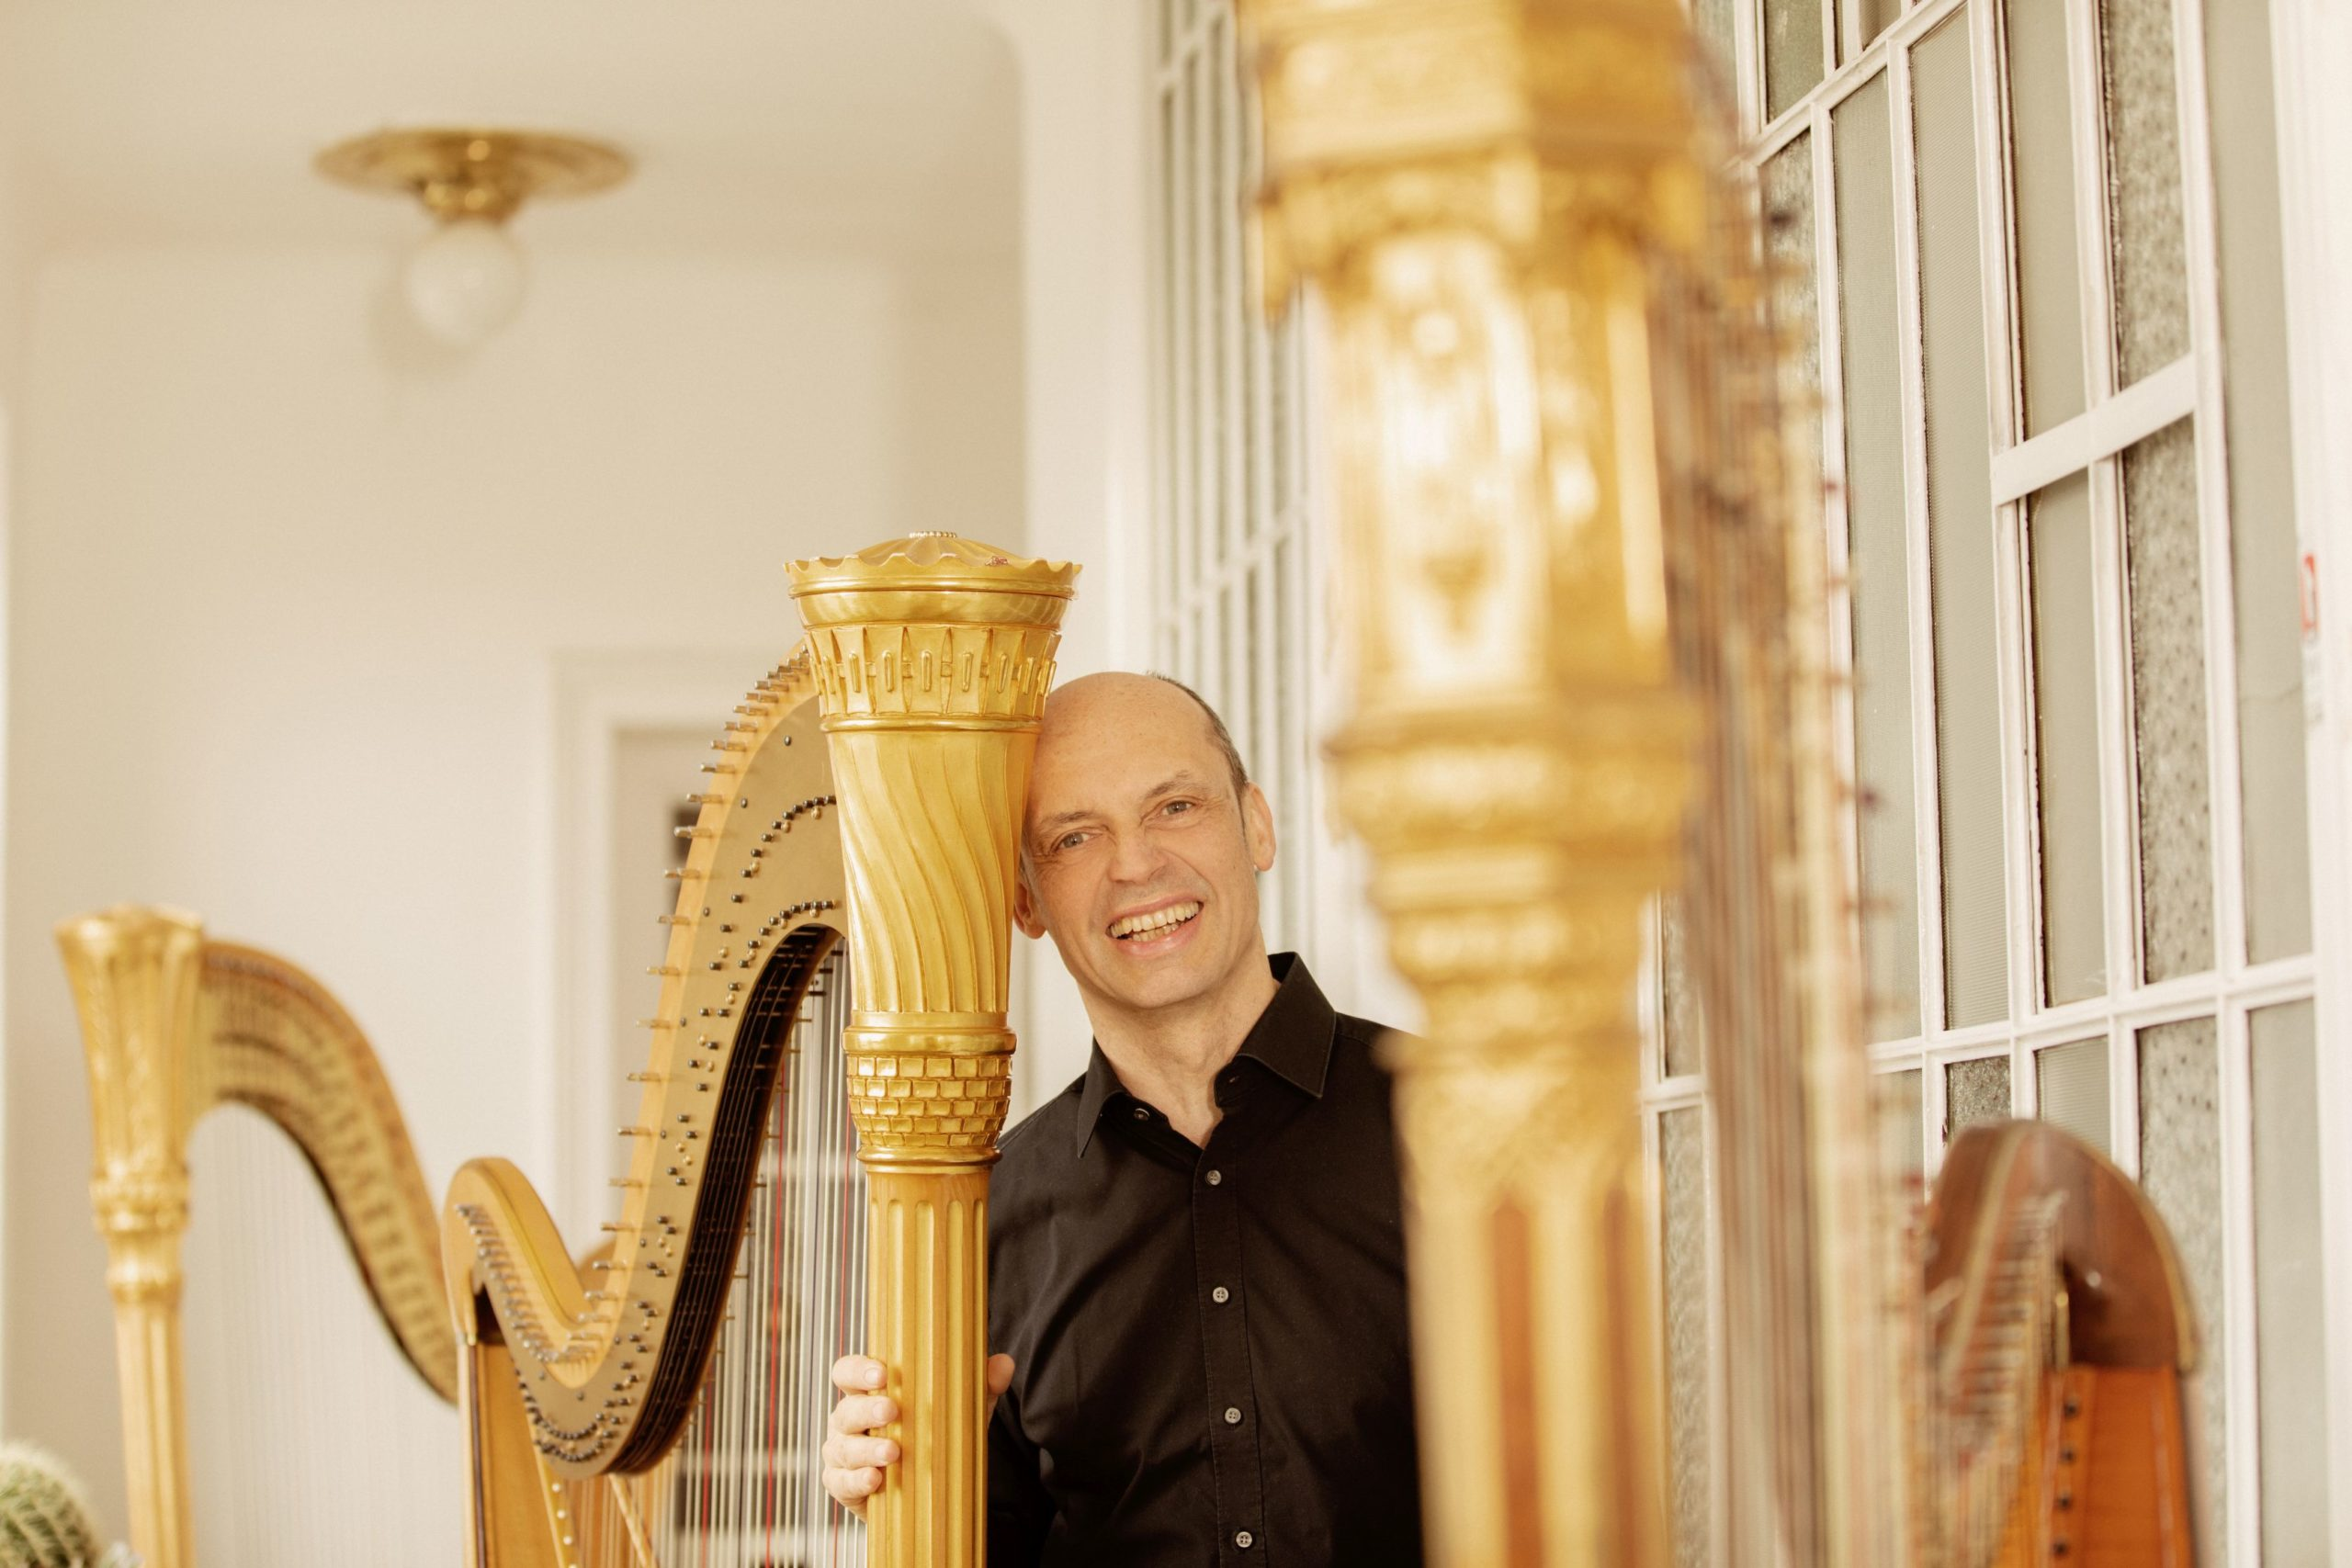 Wiener Symphoniker - Harfenworkshop mit Volker Kempf